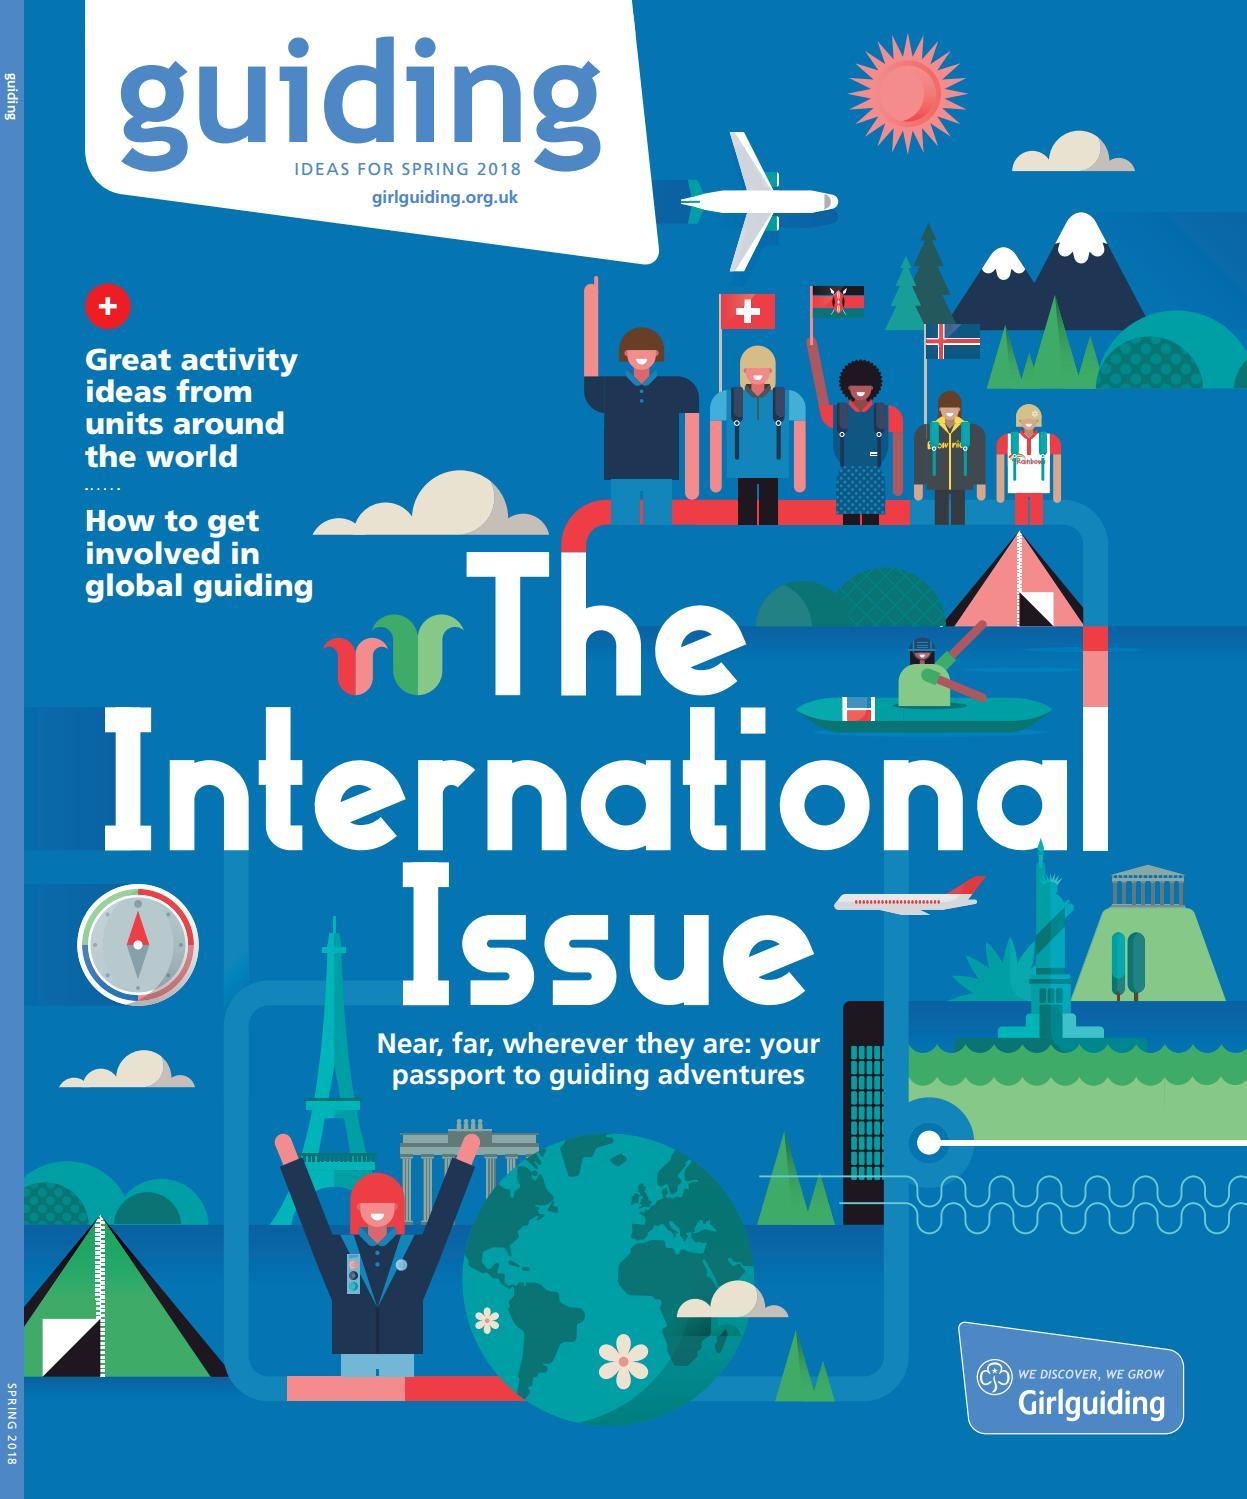 guiding magazine - the international issue by Girlguiding